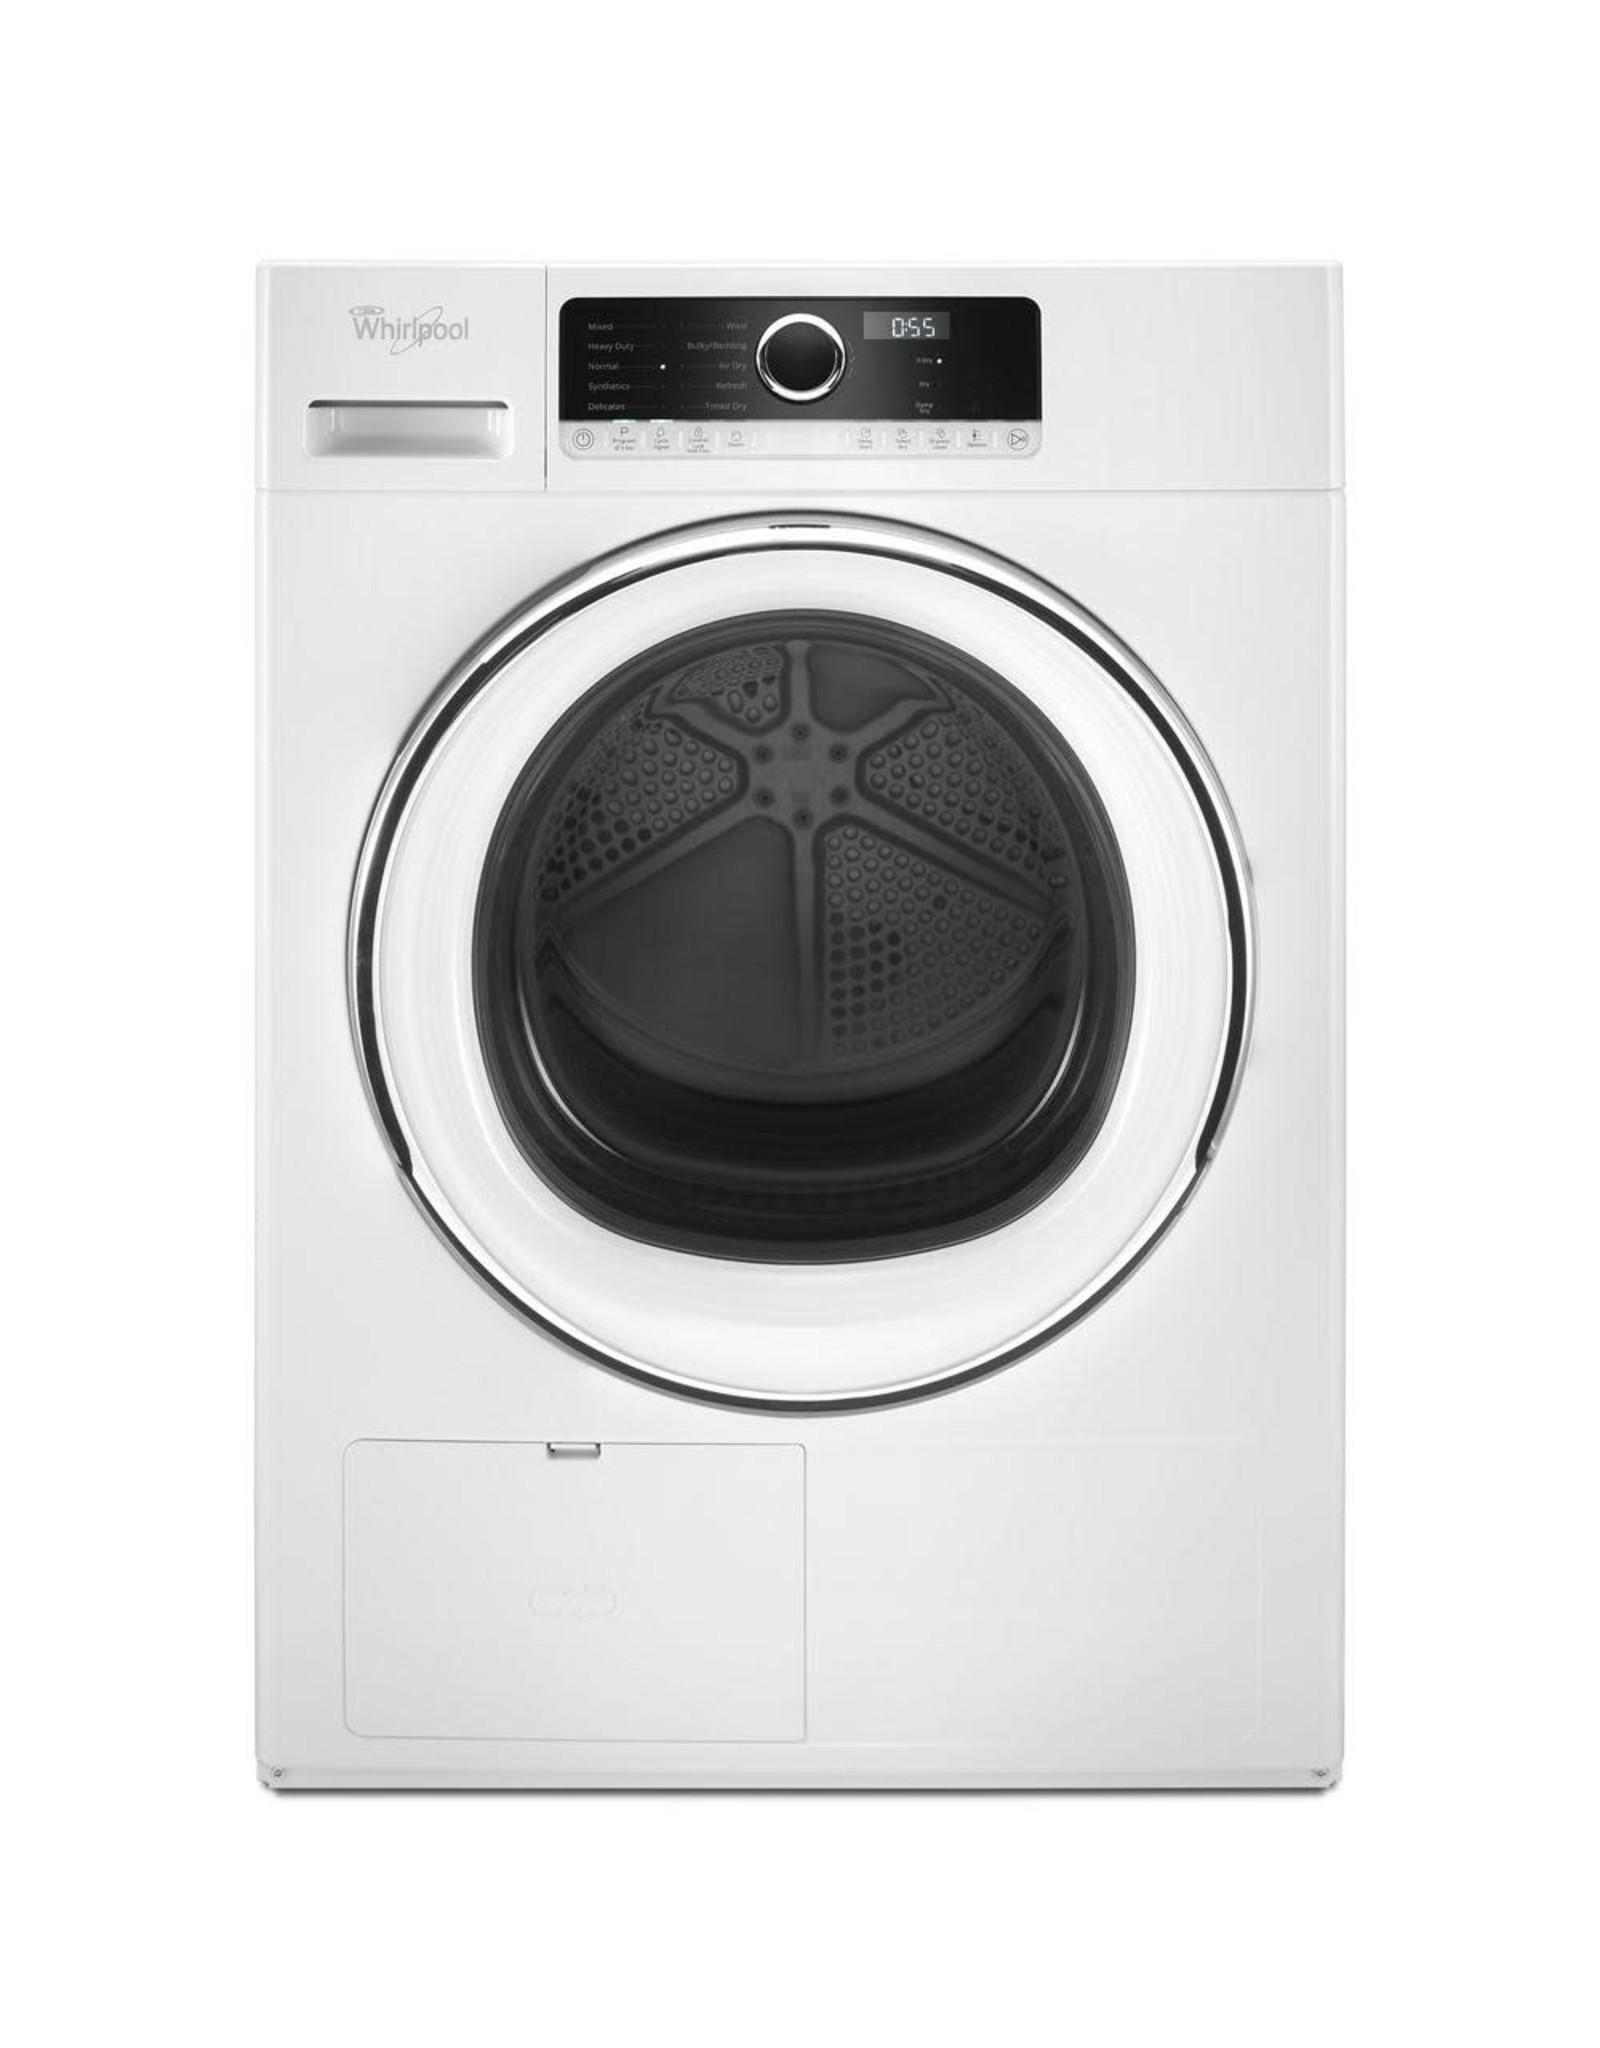 WHD5090GW /126 WHR Air Vented-Dryer FL Match - 4.3 CU. FT., VENTLESS HEAT PUMP, 10 CYCL